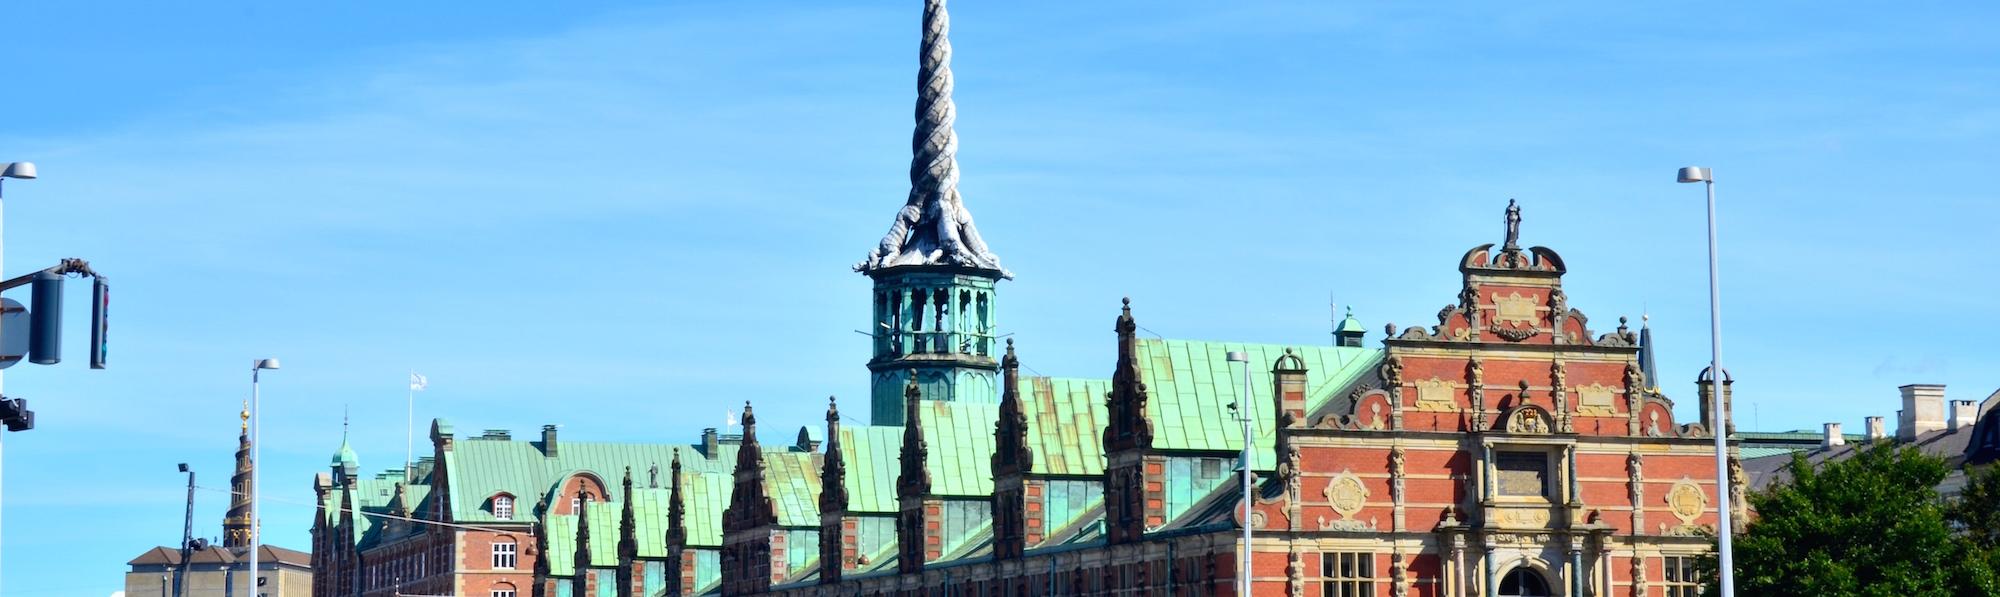 Norrebro-Christianshavn, Copenhague